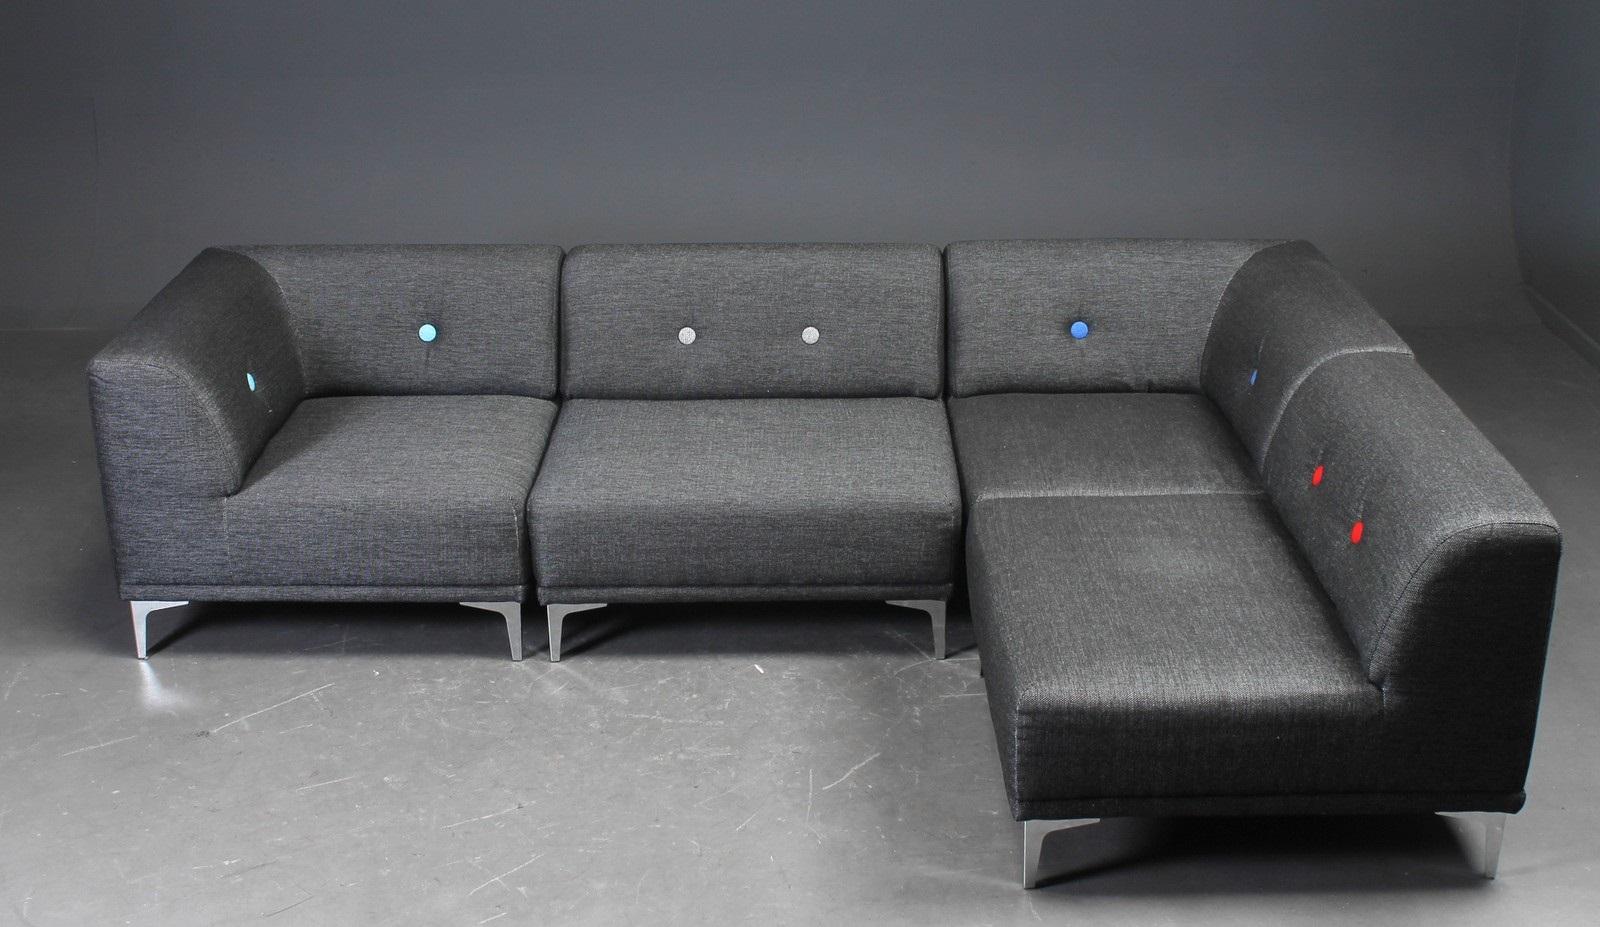 Sofa, FiftyOne Module Sofa 4 PCS   Morten Voss